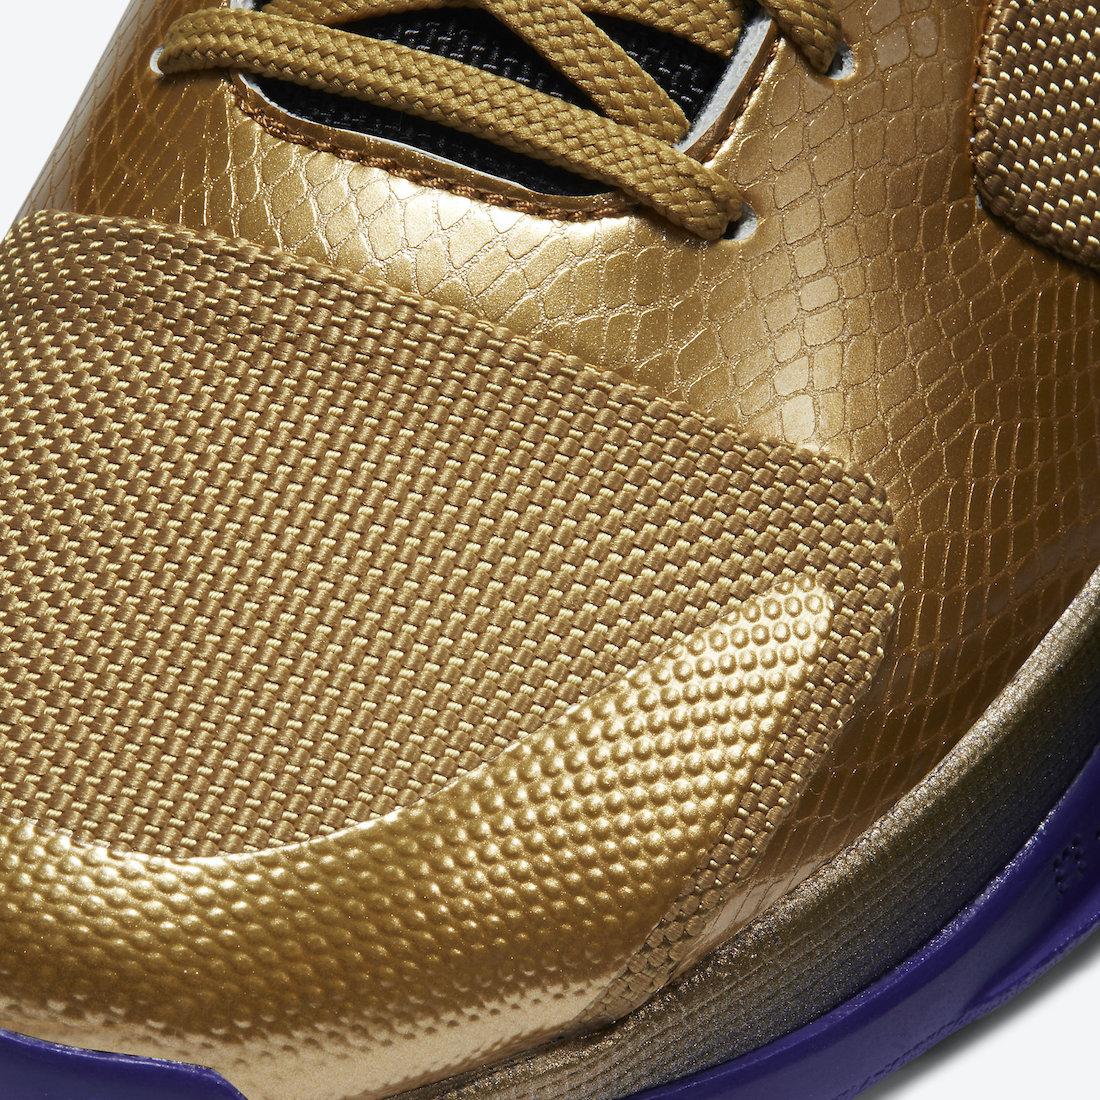 Undefeated-Nike-Kobe-5-Protro-Hall-of-Fame-DA6809-700-Release-Date-6